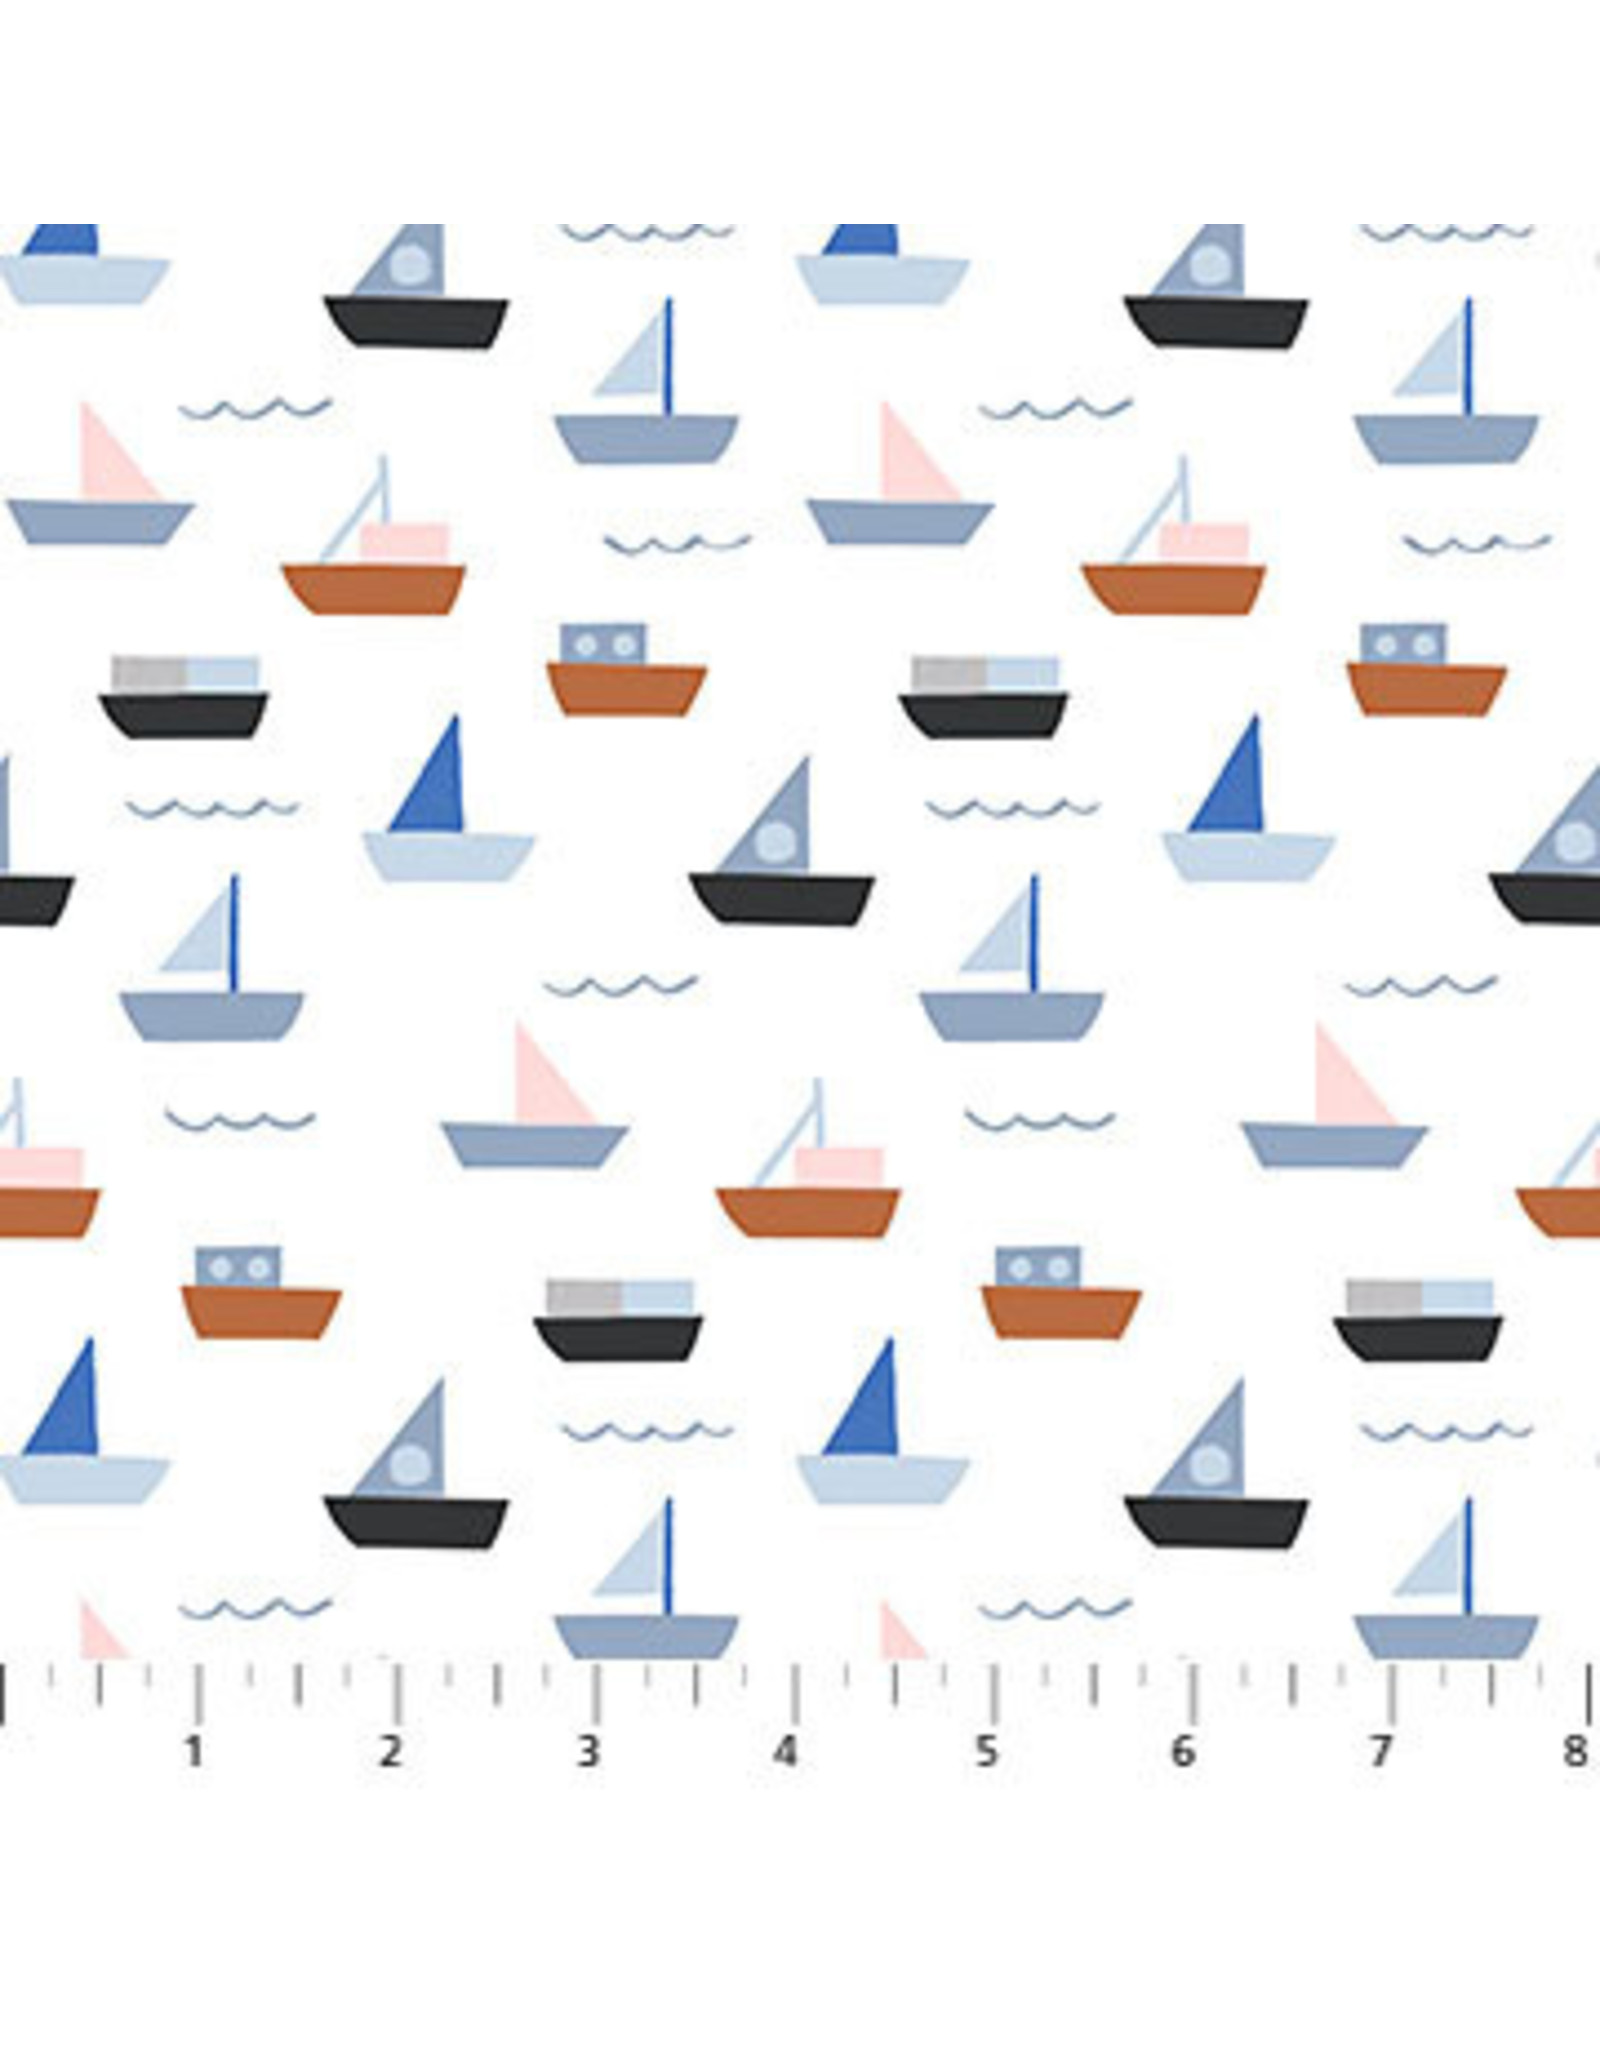 Figo Moonlit Voyage - Boats in White